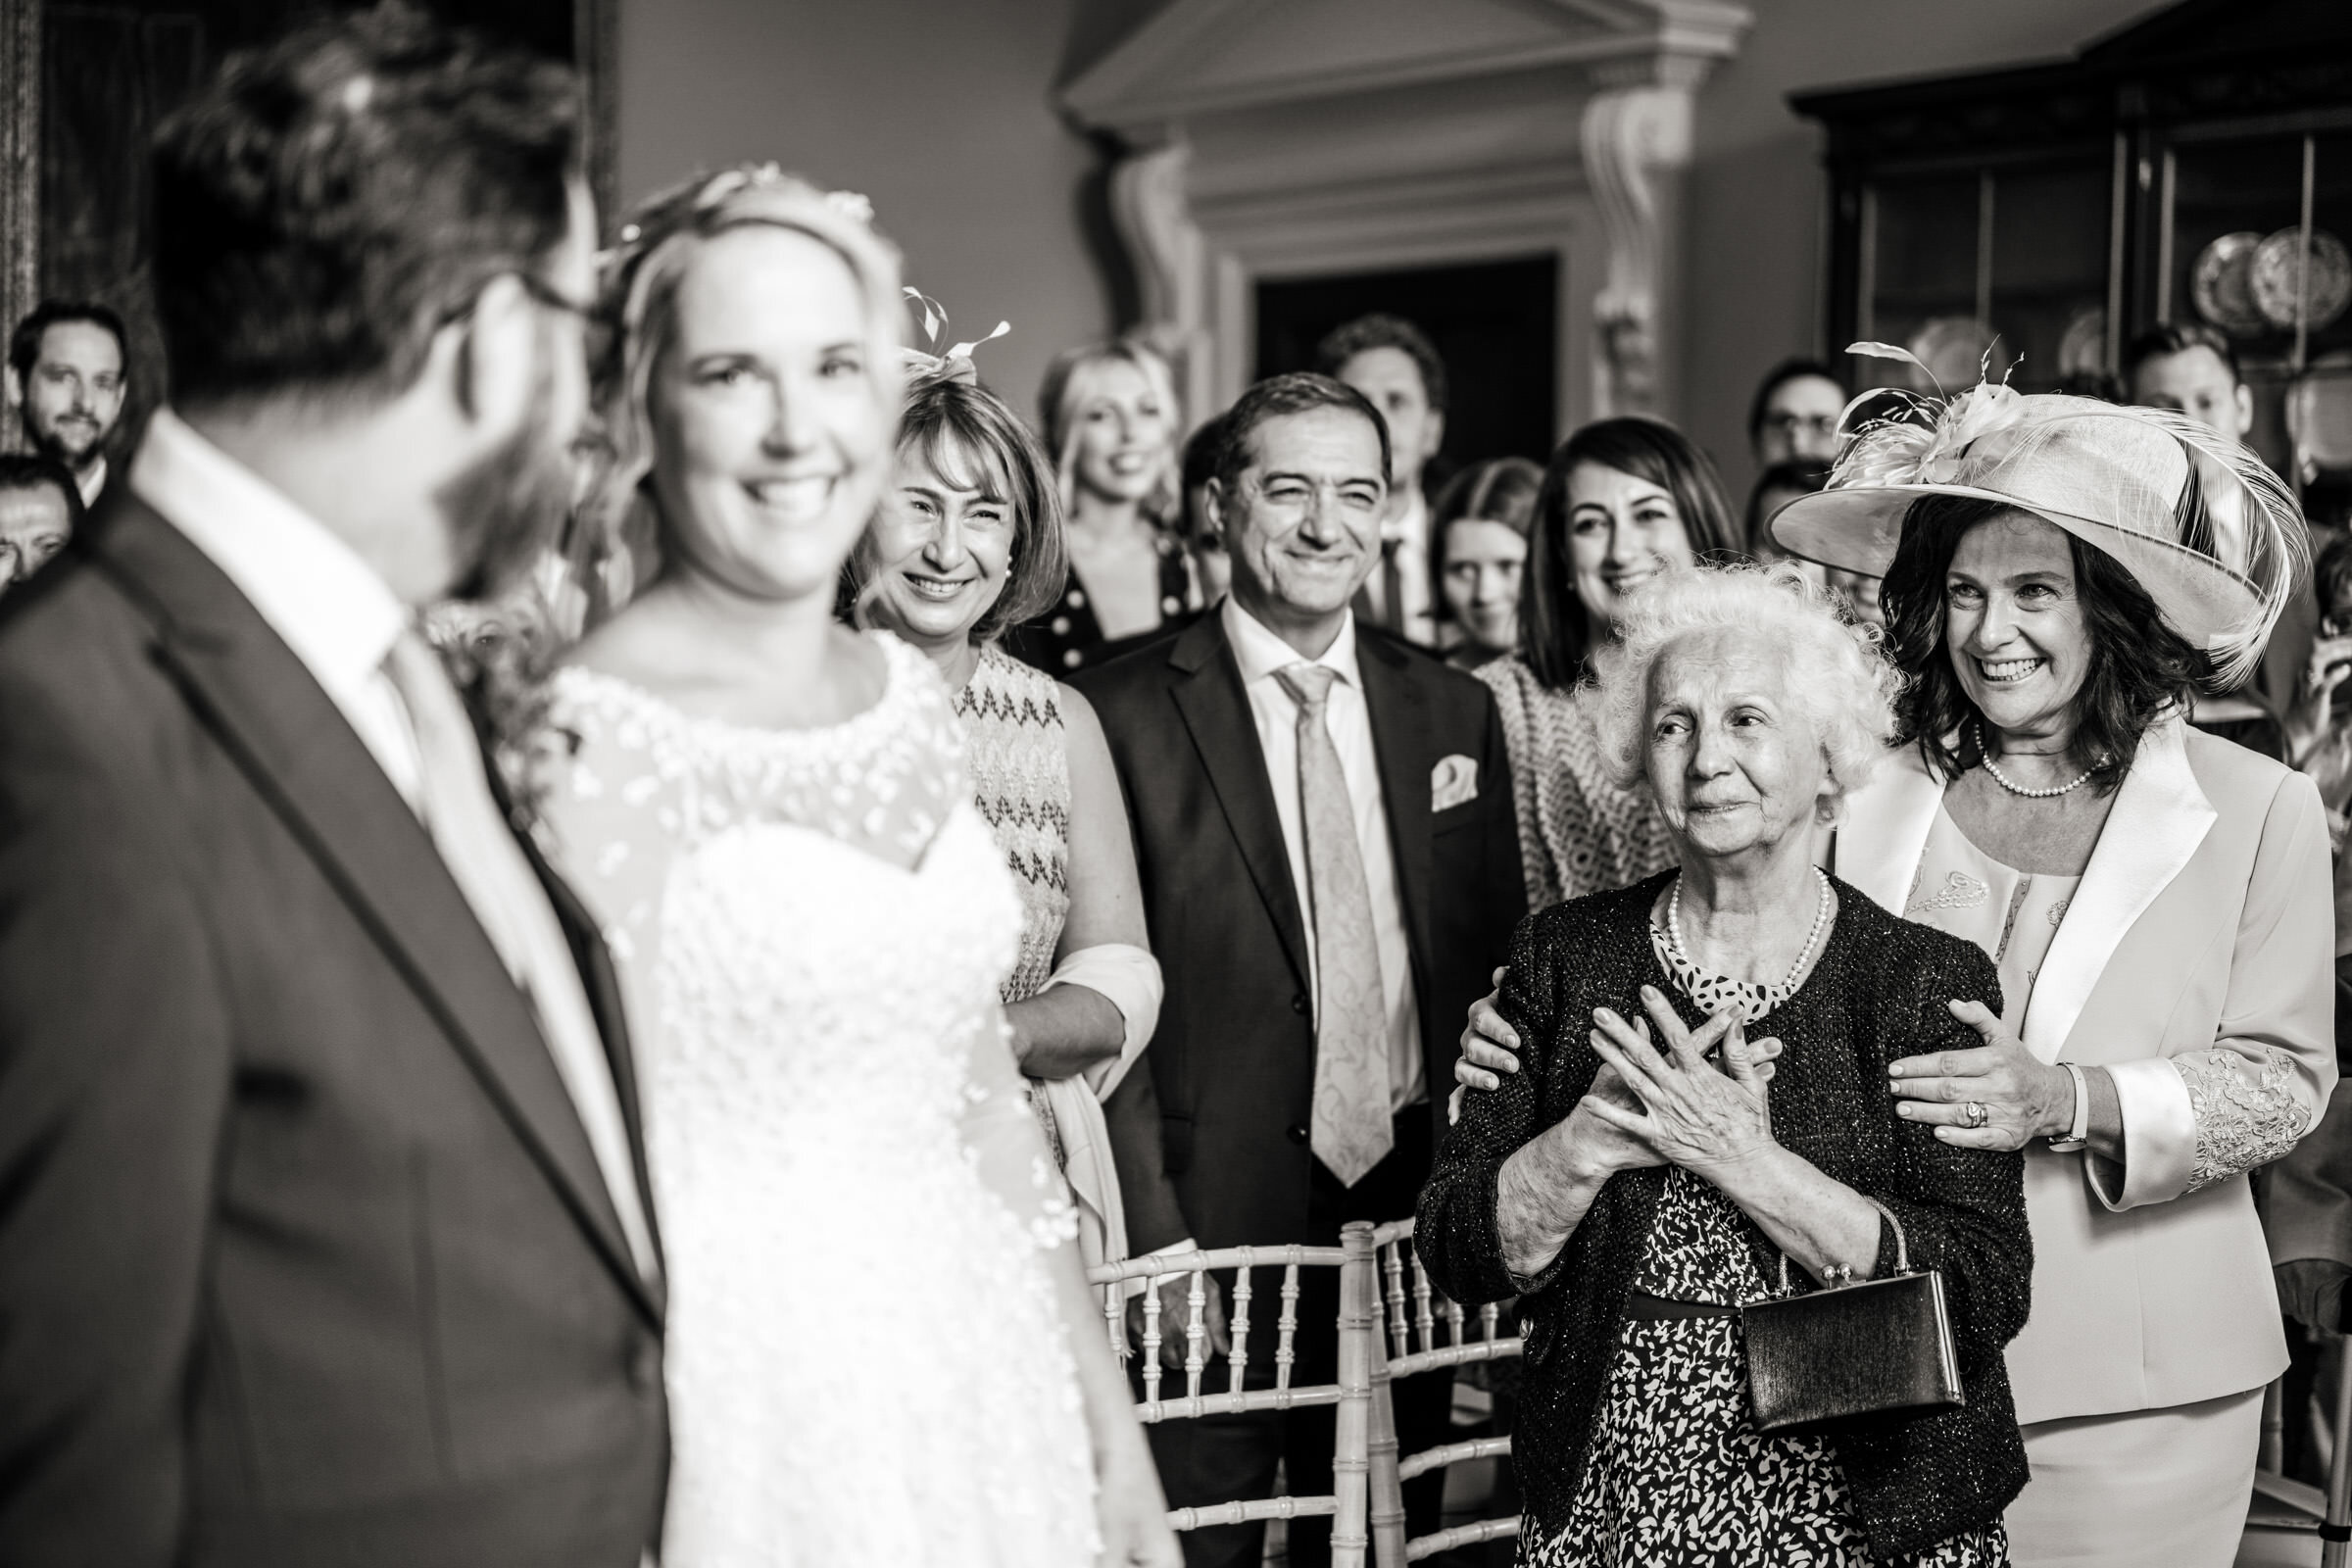 《婚礼》的电影……